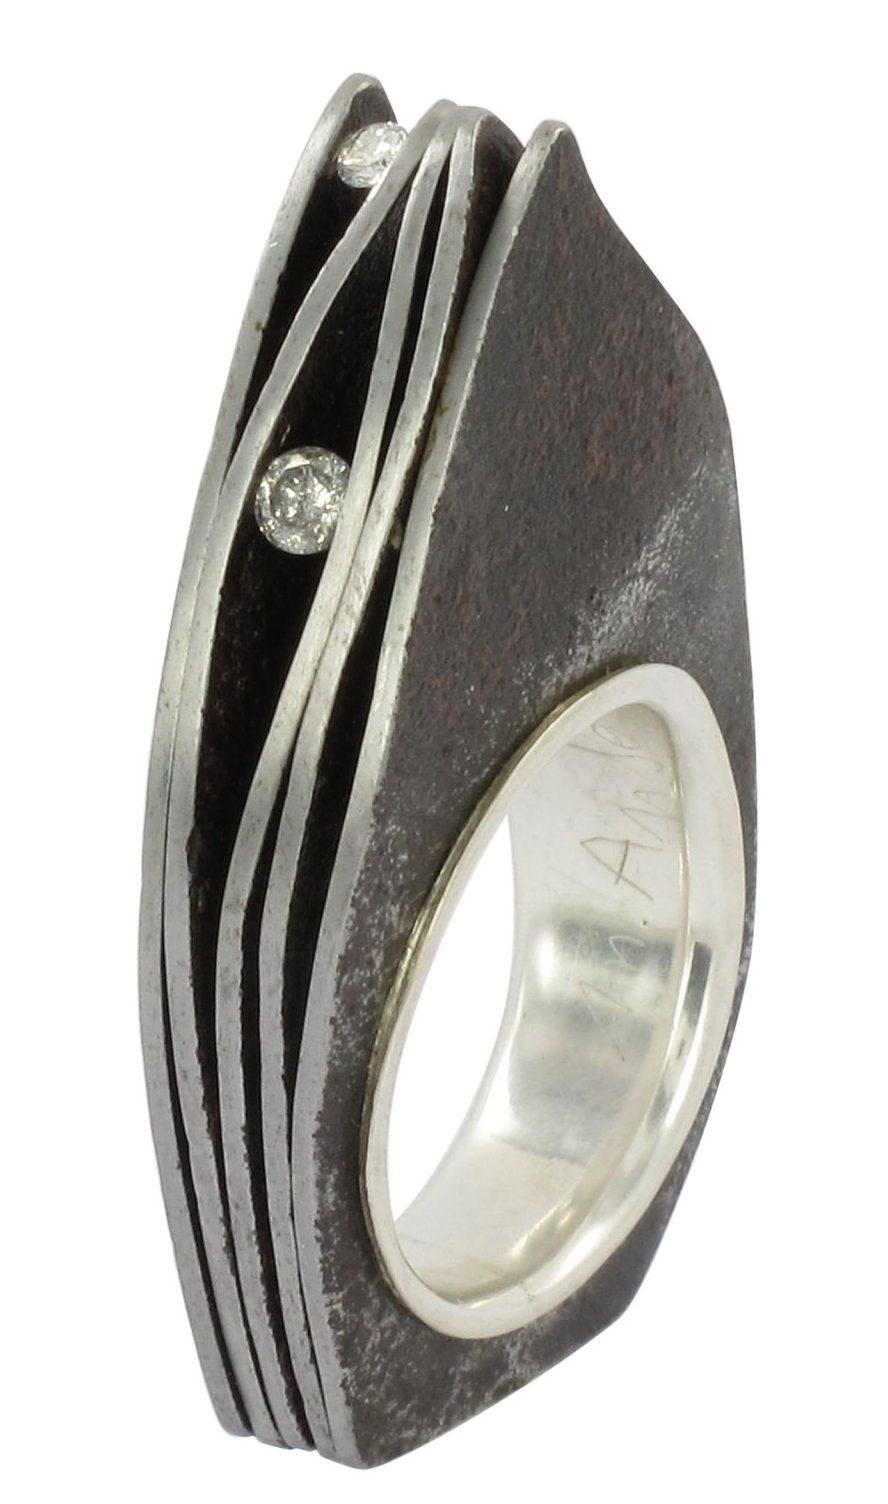 Marianne Anselin, ring, metaal, diamanten